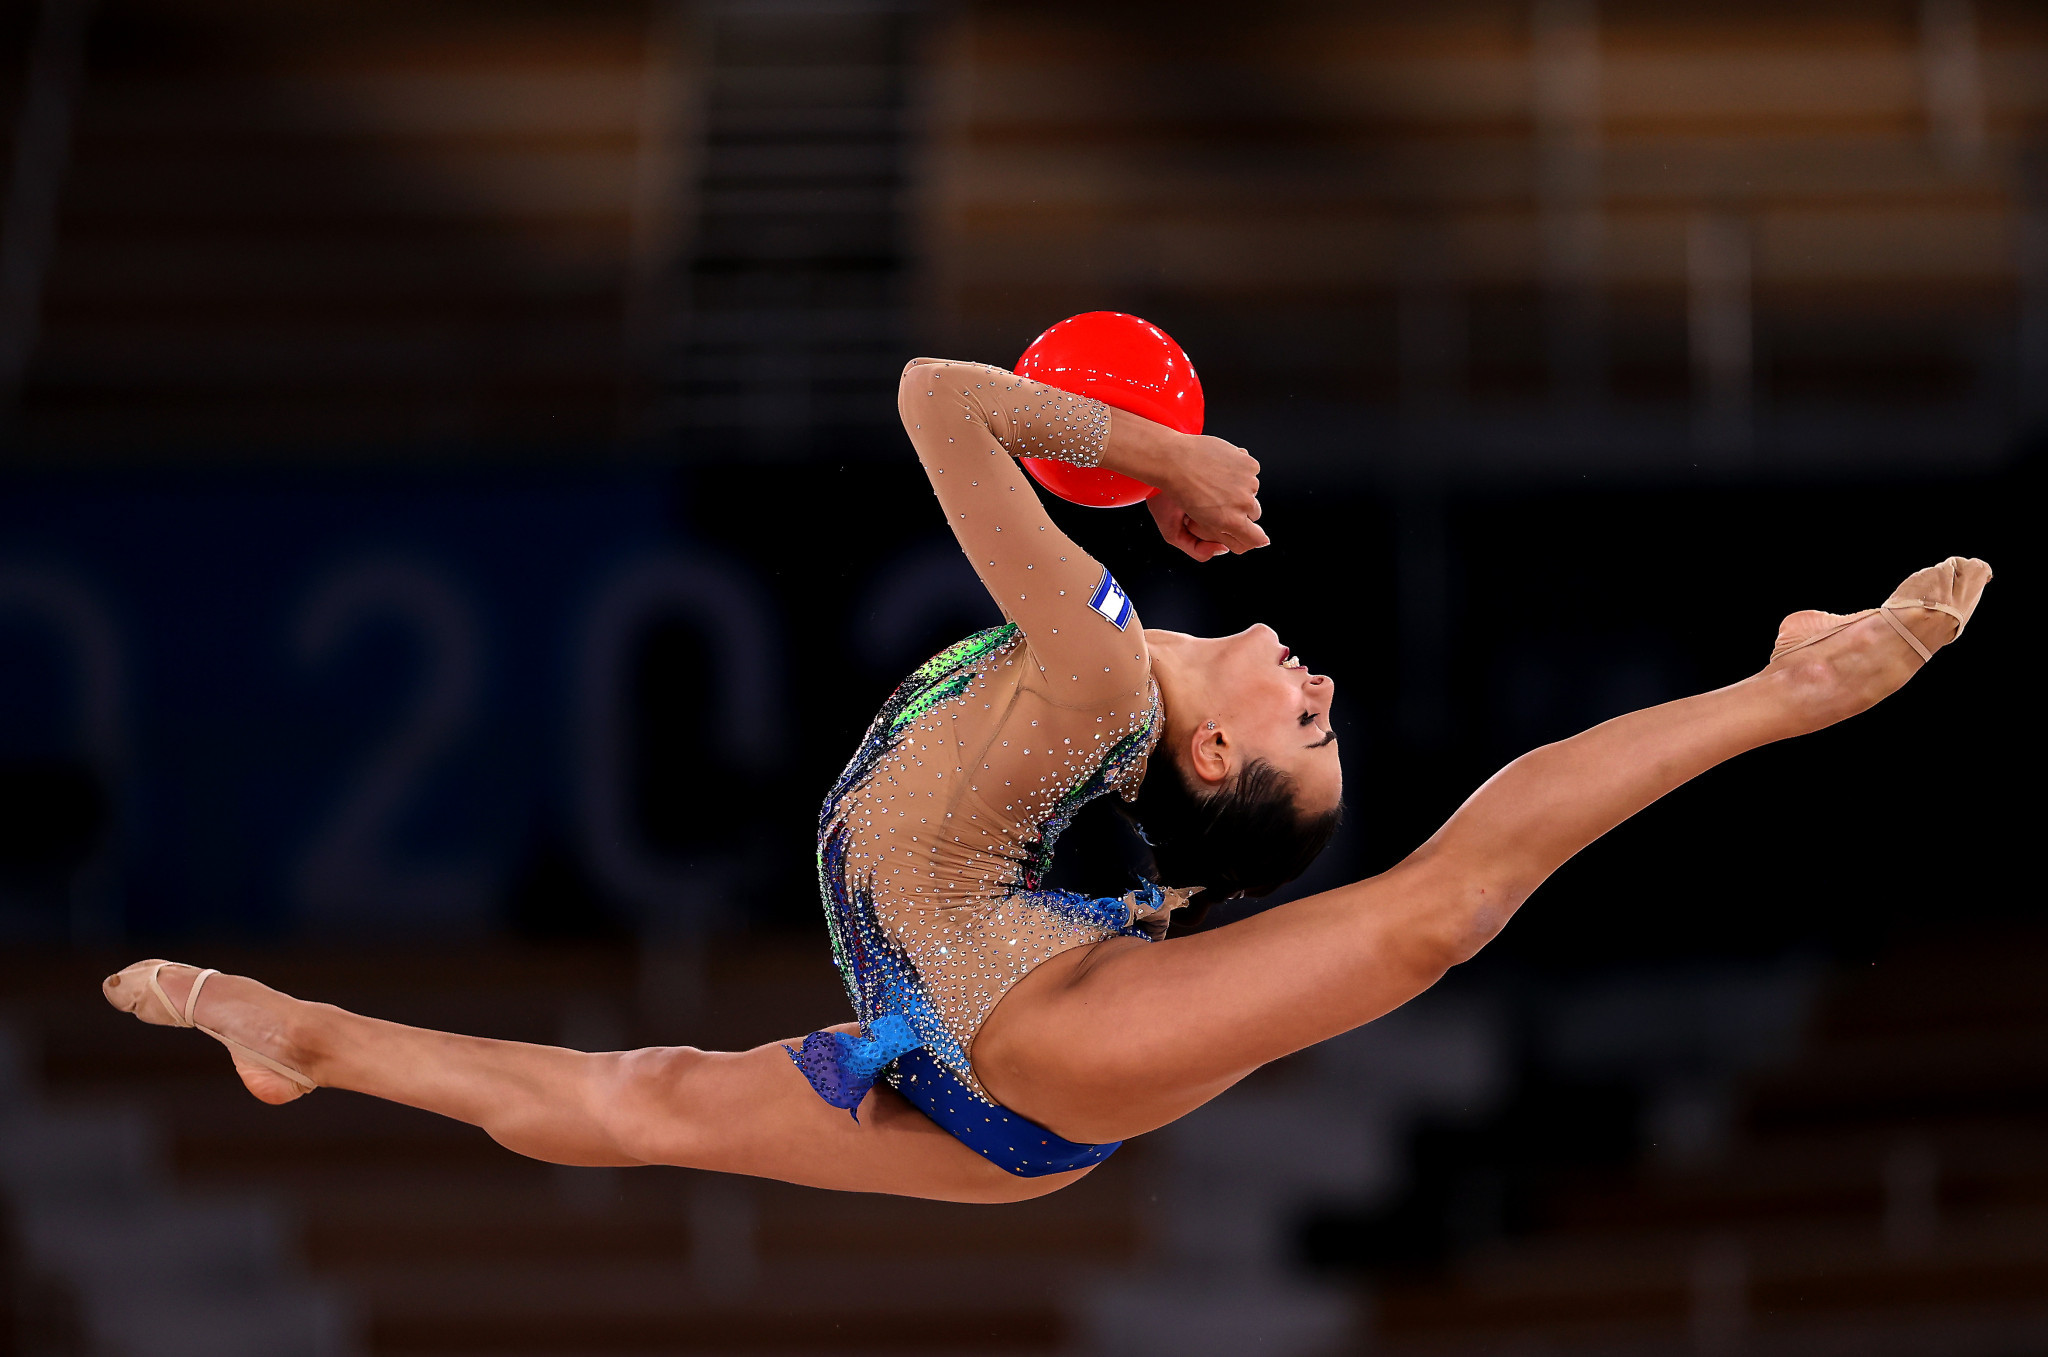 Israel's Ashram stuns Averina twins to win Olympic all-around title in rhythmic gymnastics